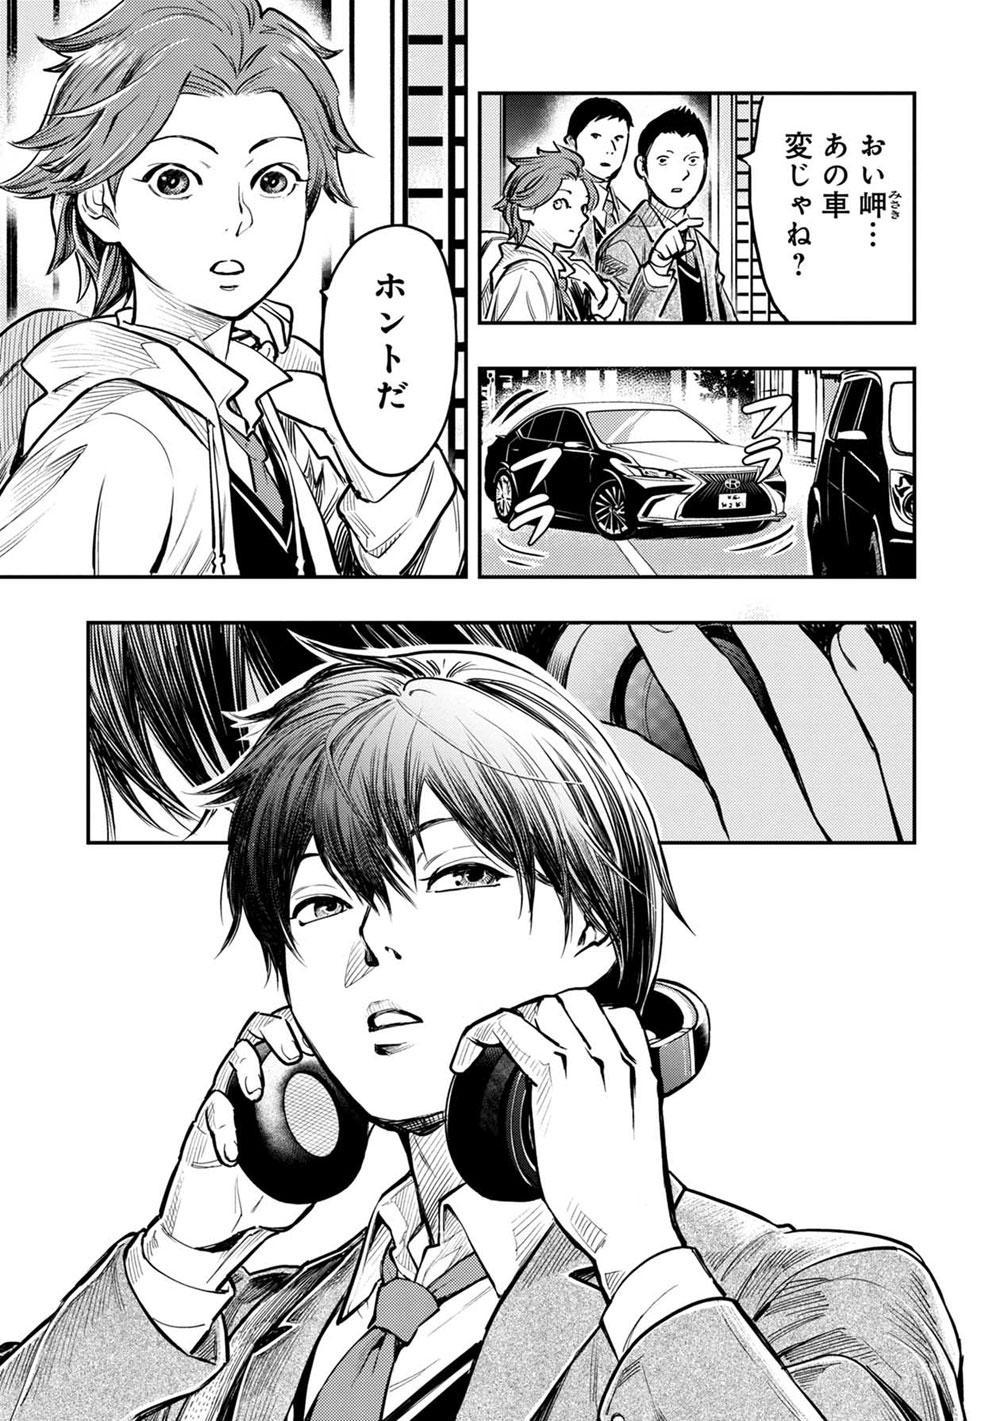 inugami_re_001_017.jpg